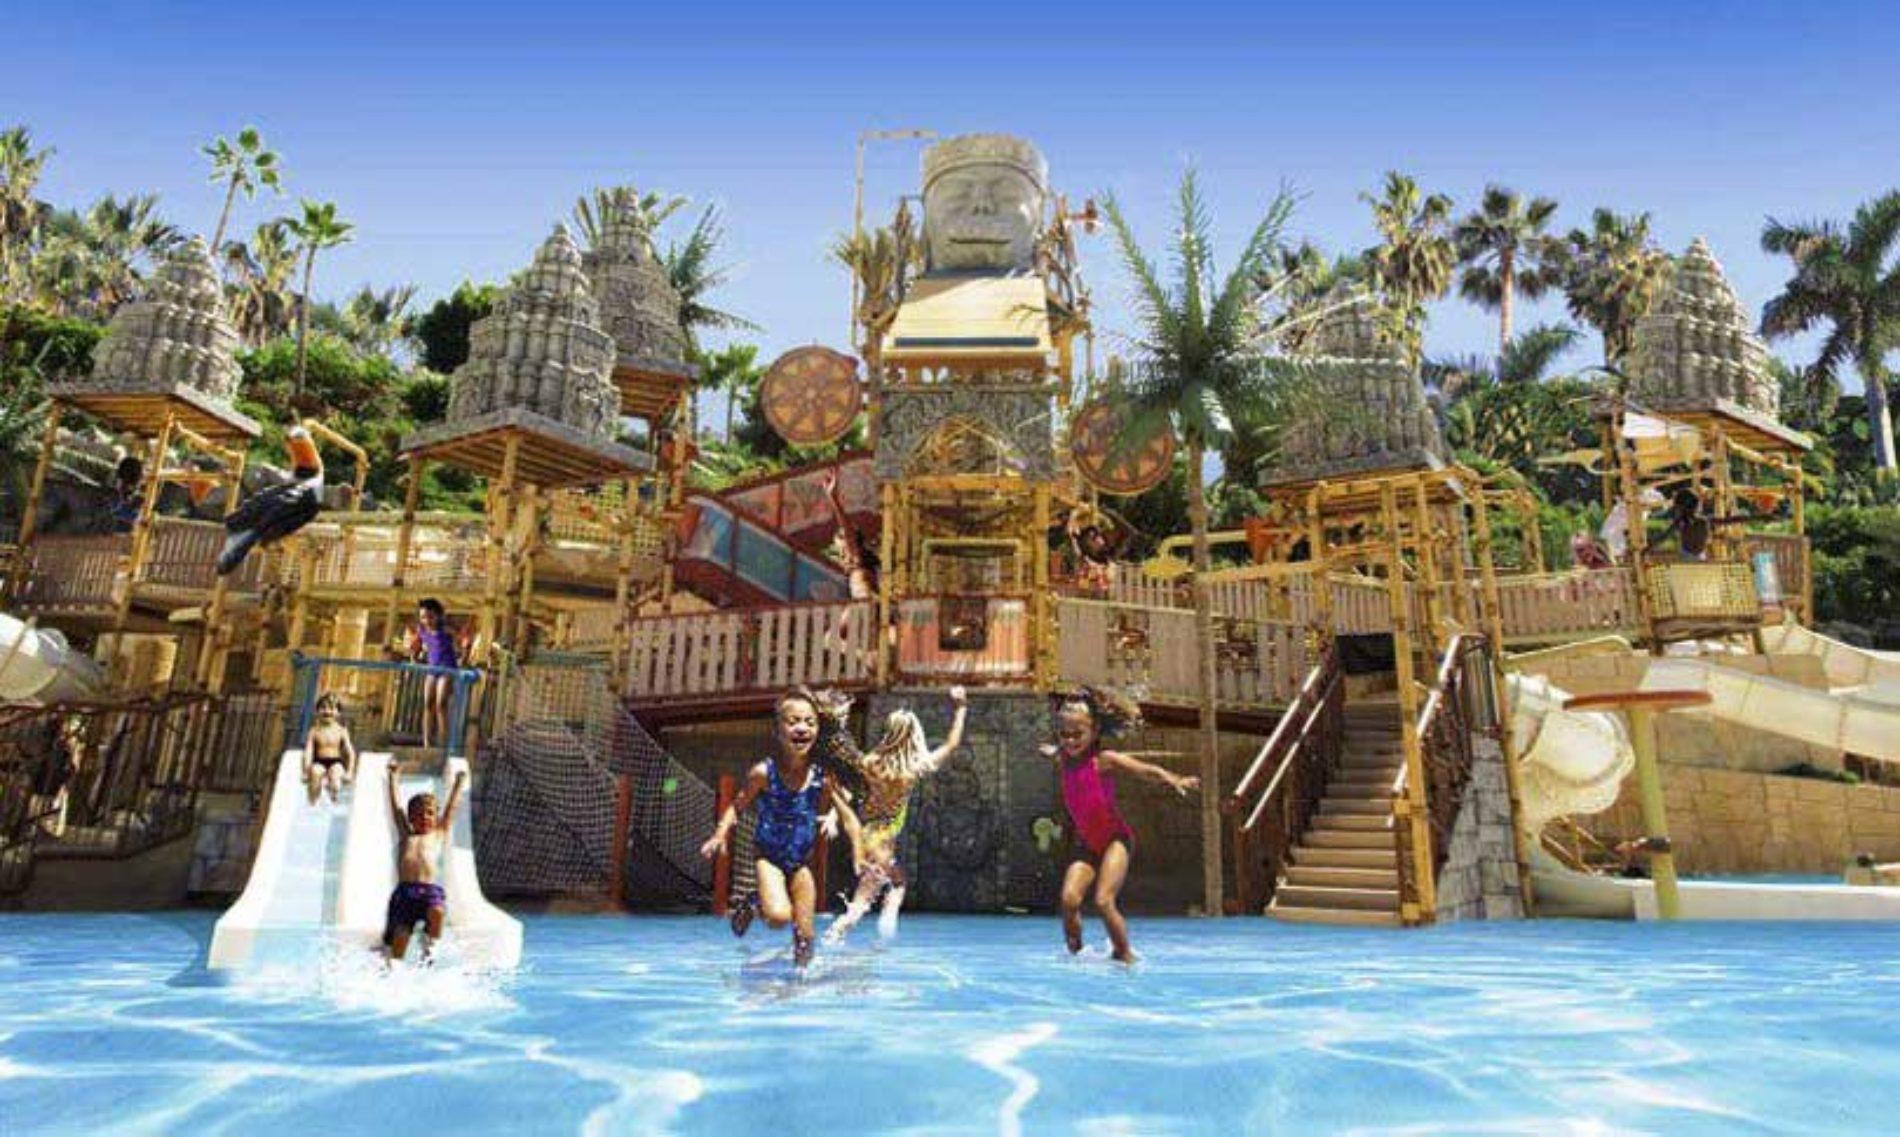 Fornøyelsesparker på Tenerife